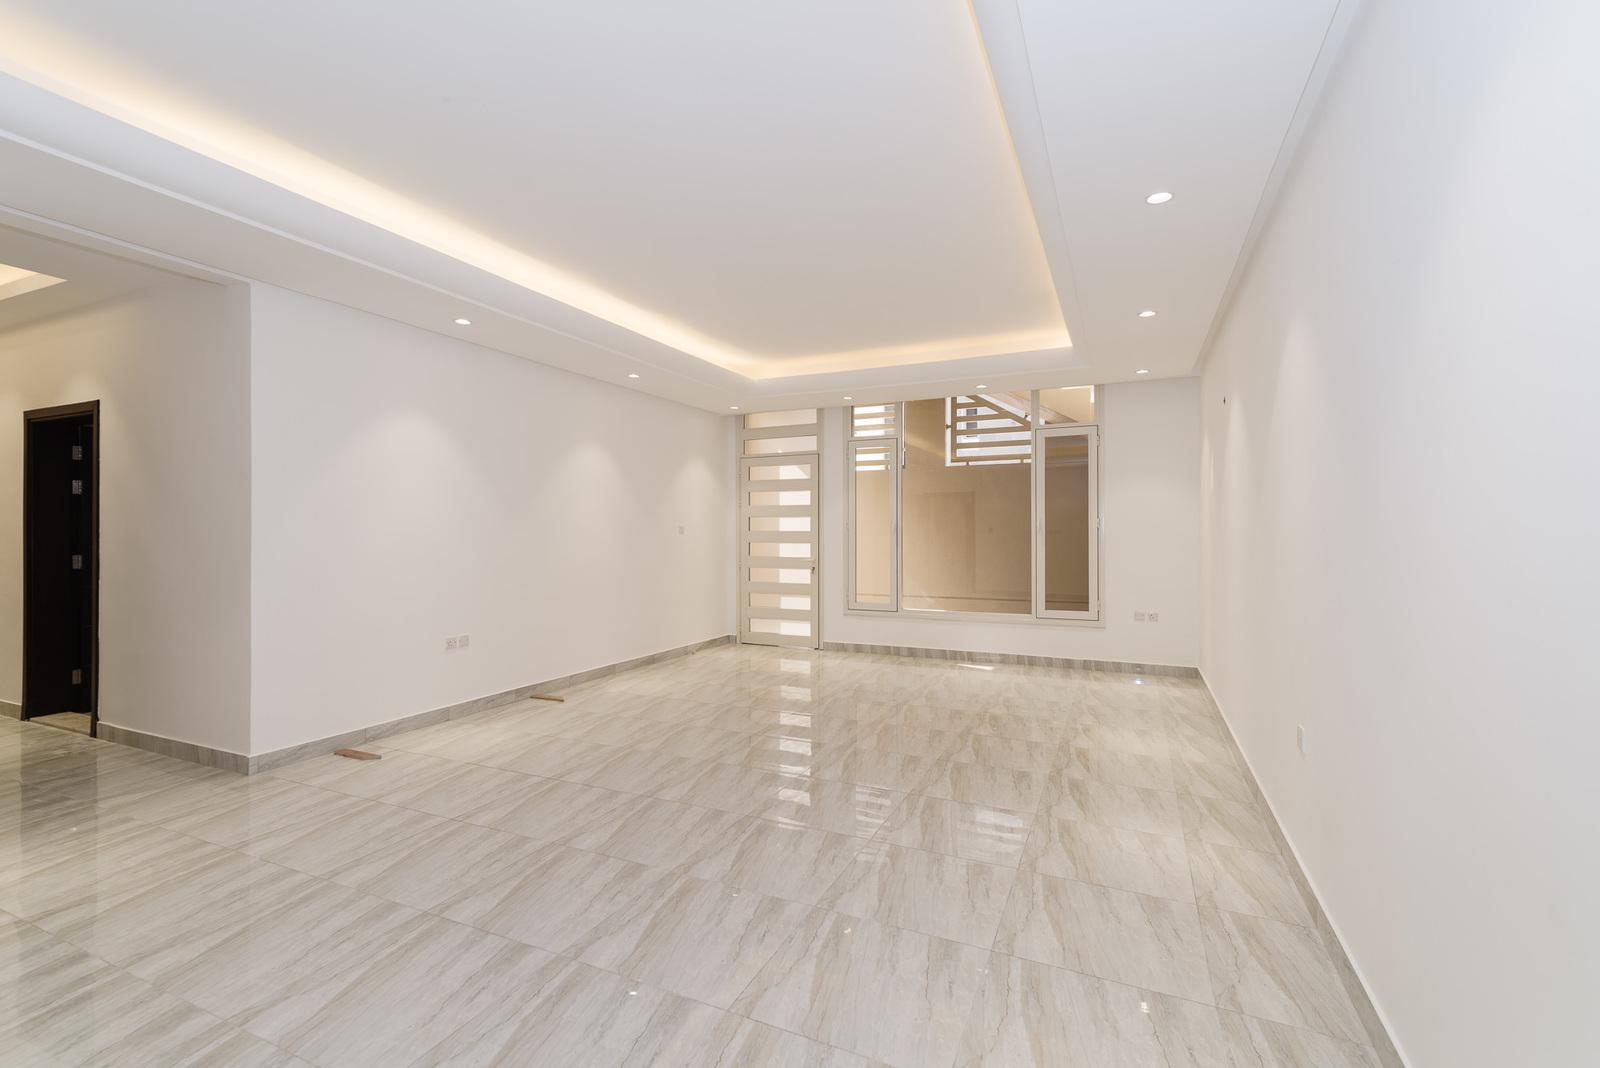 Masayel – brand new, unfurnished, three bedroom apartments